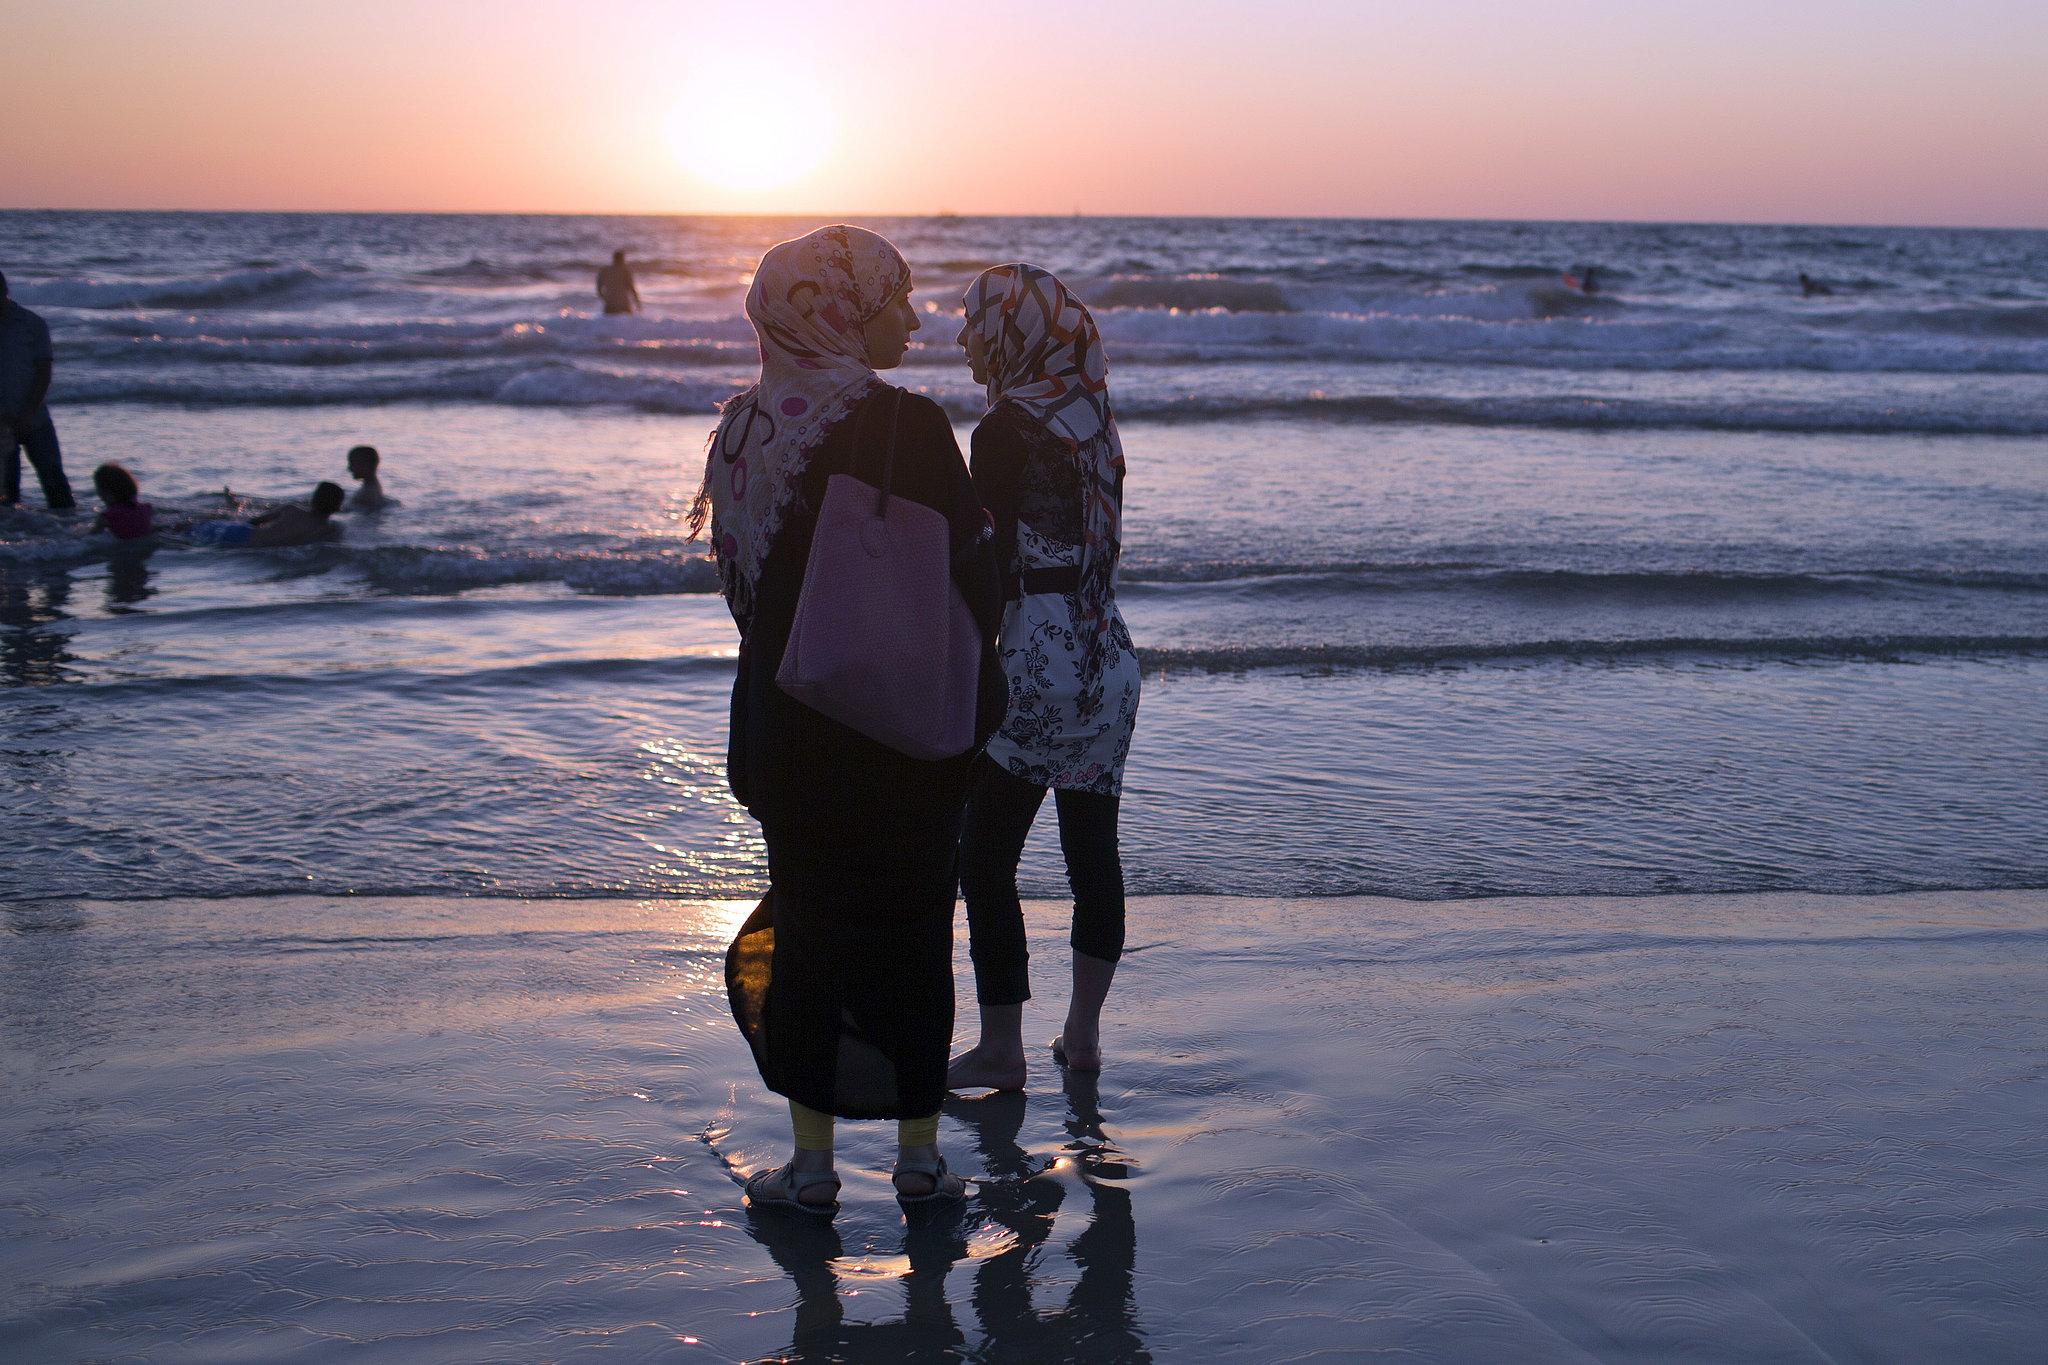 Women in Tel Aviv, Israel, took in the sunset during Eid